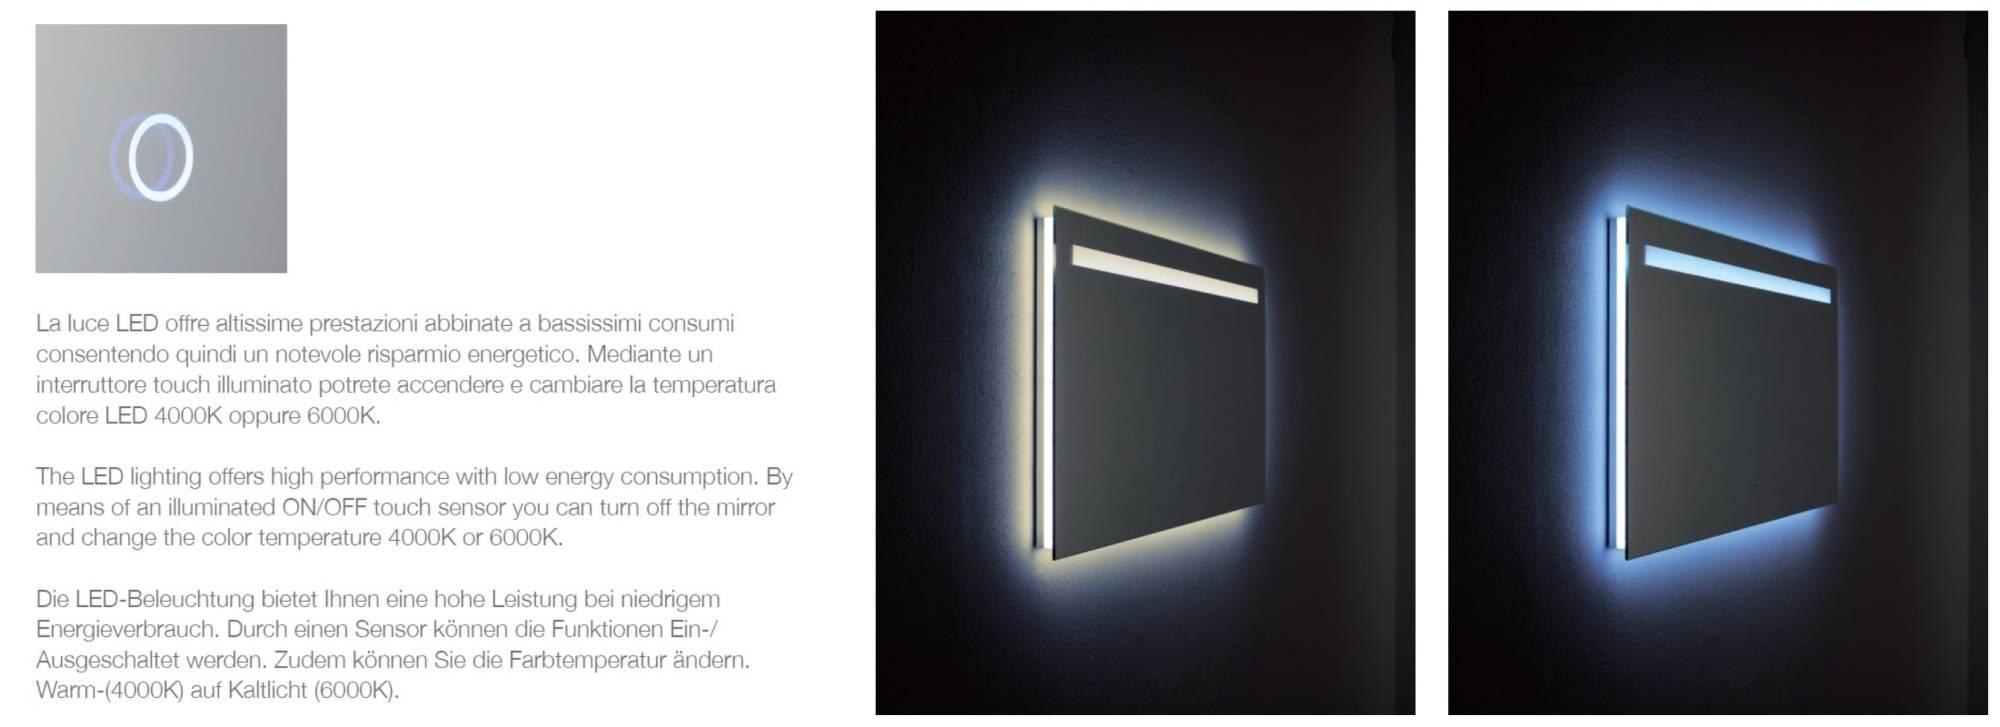 miroir_salle de bain_dorado_interrupteur_touch_screen_avec_changement de_température_led_4000K_6000K